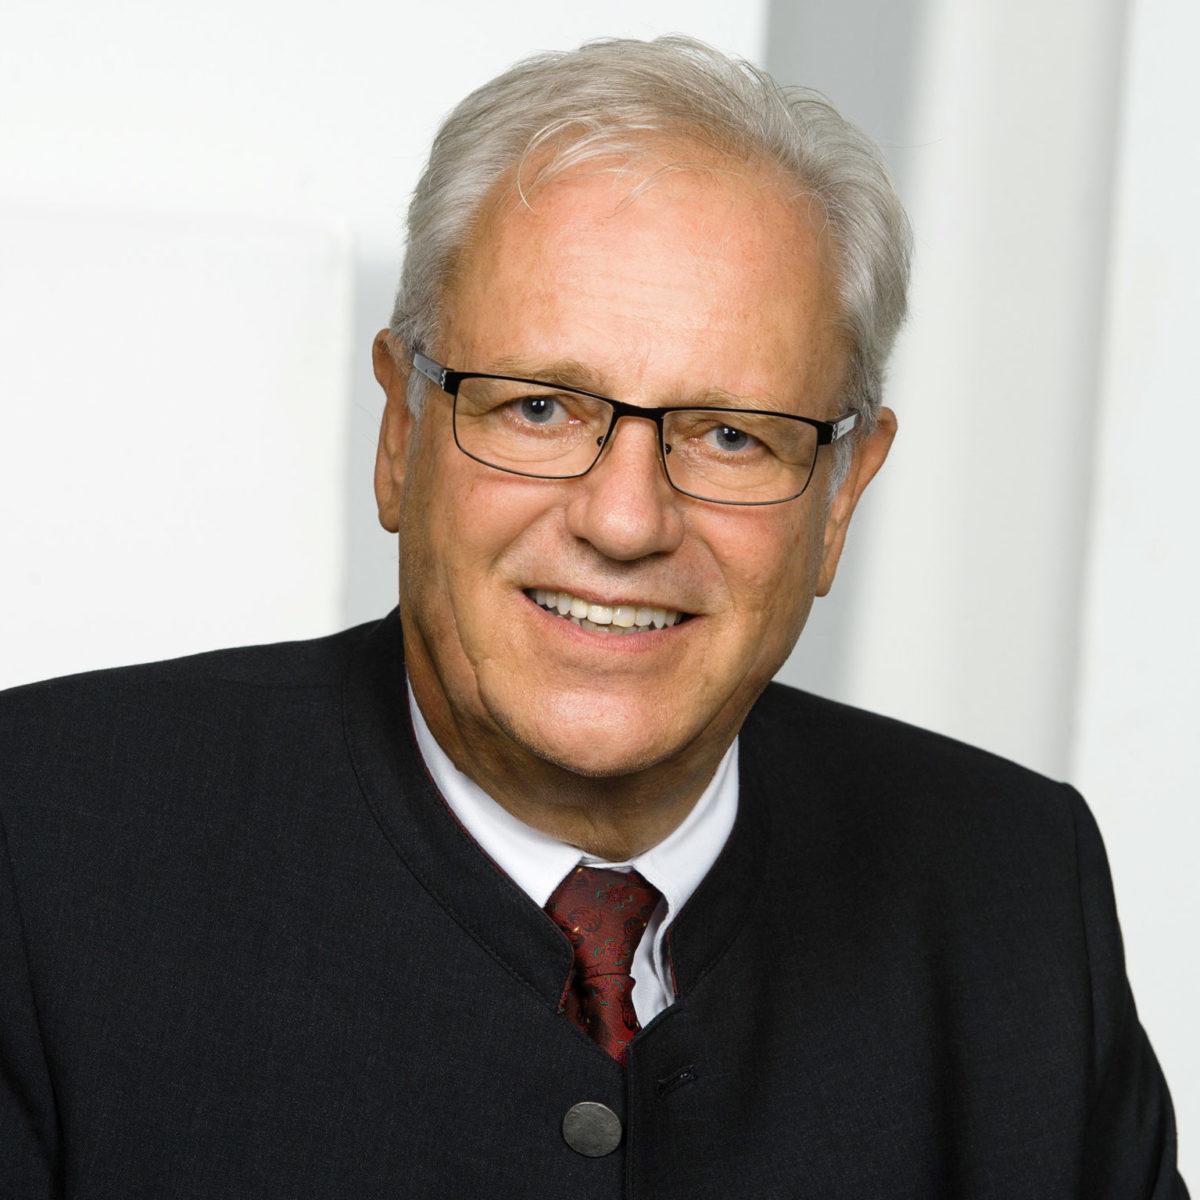 Friedrich Riess